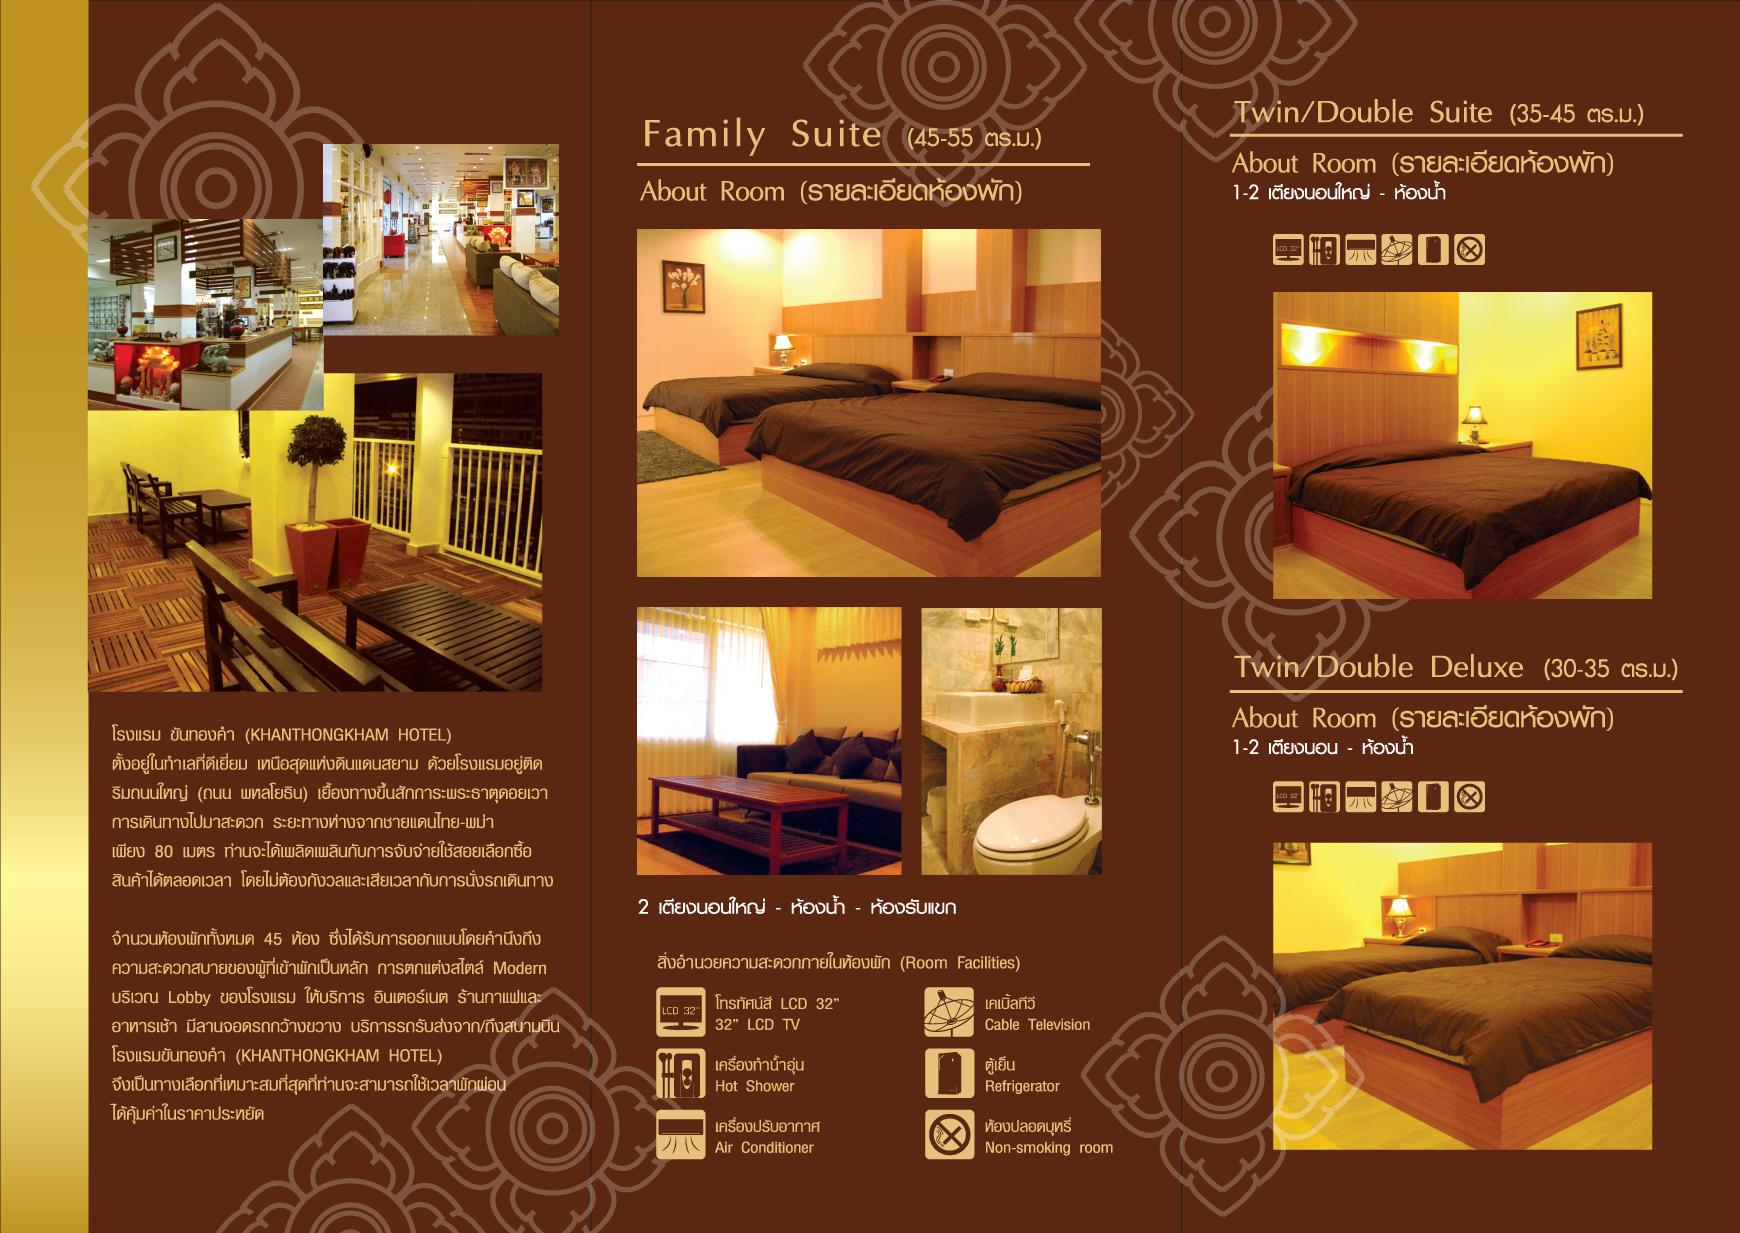 room rates hotel facilities hotel brochure ...